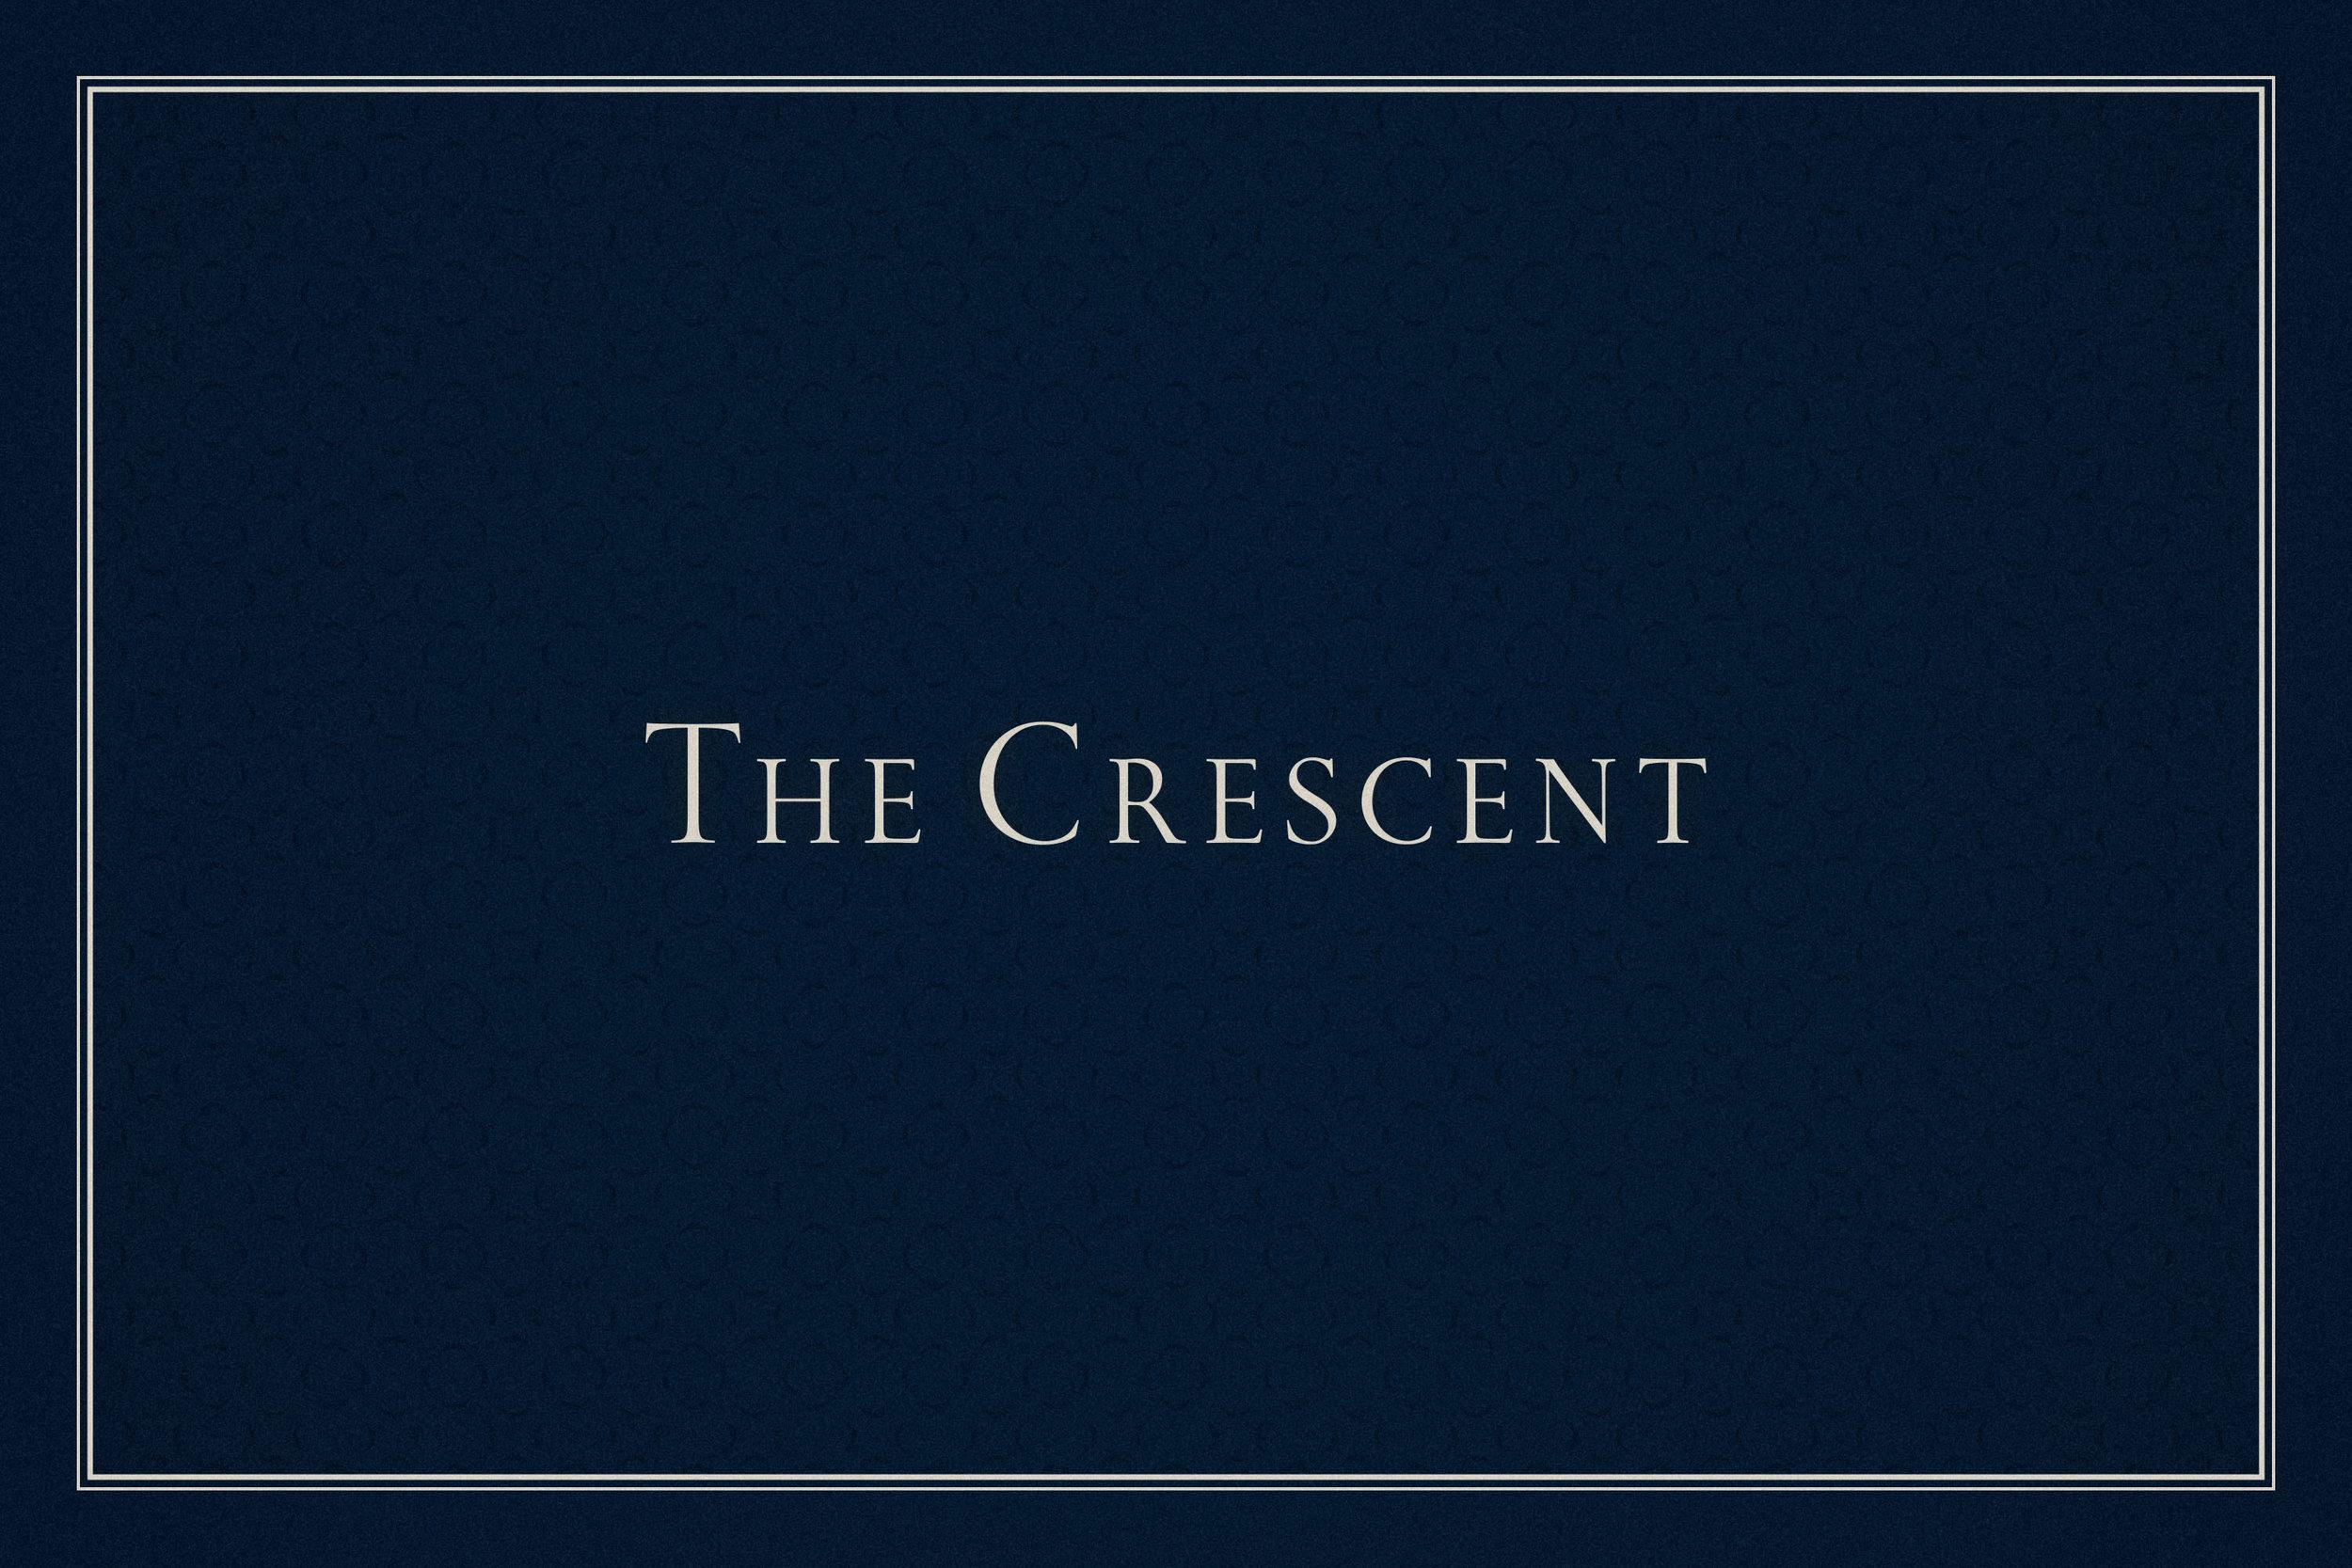 ronaldvillegas-the-crescent-dallas-identity-logotype.jpg